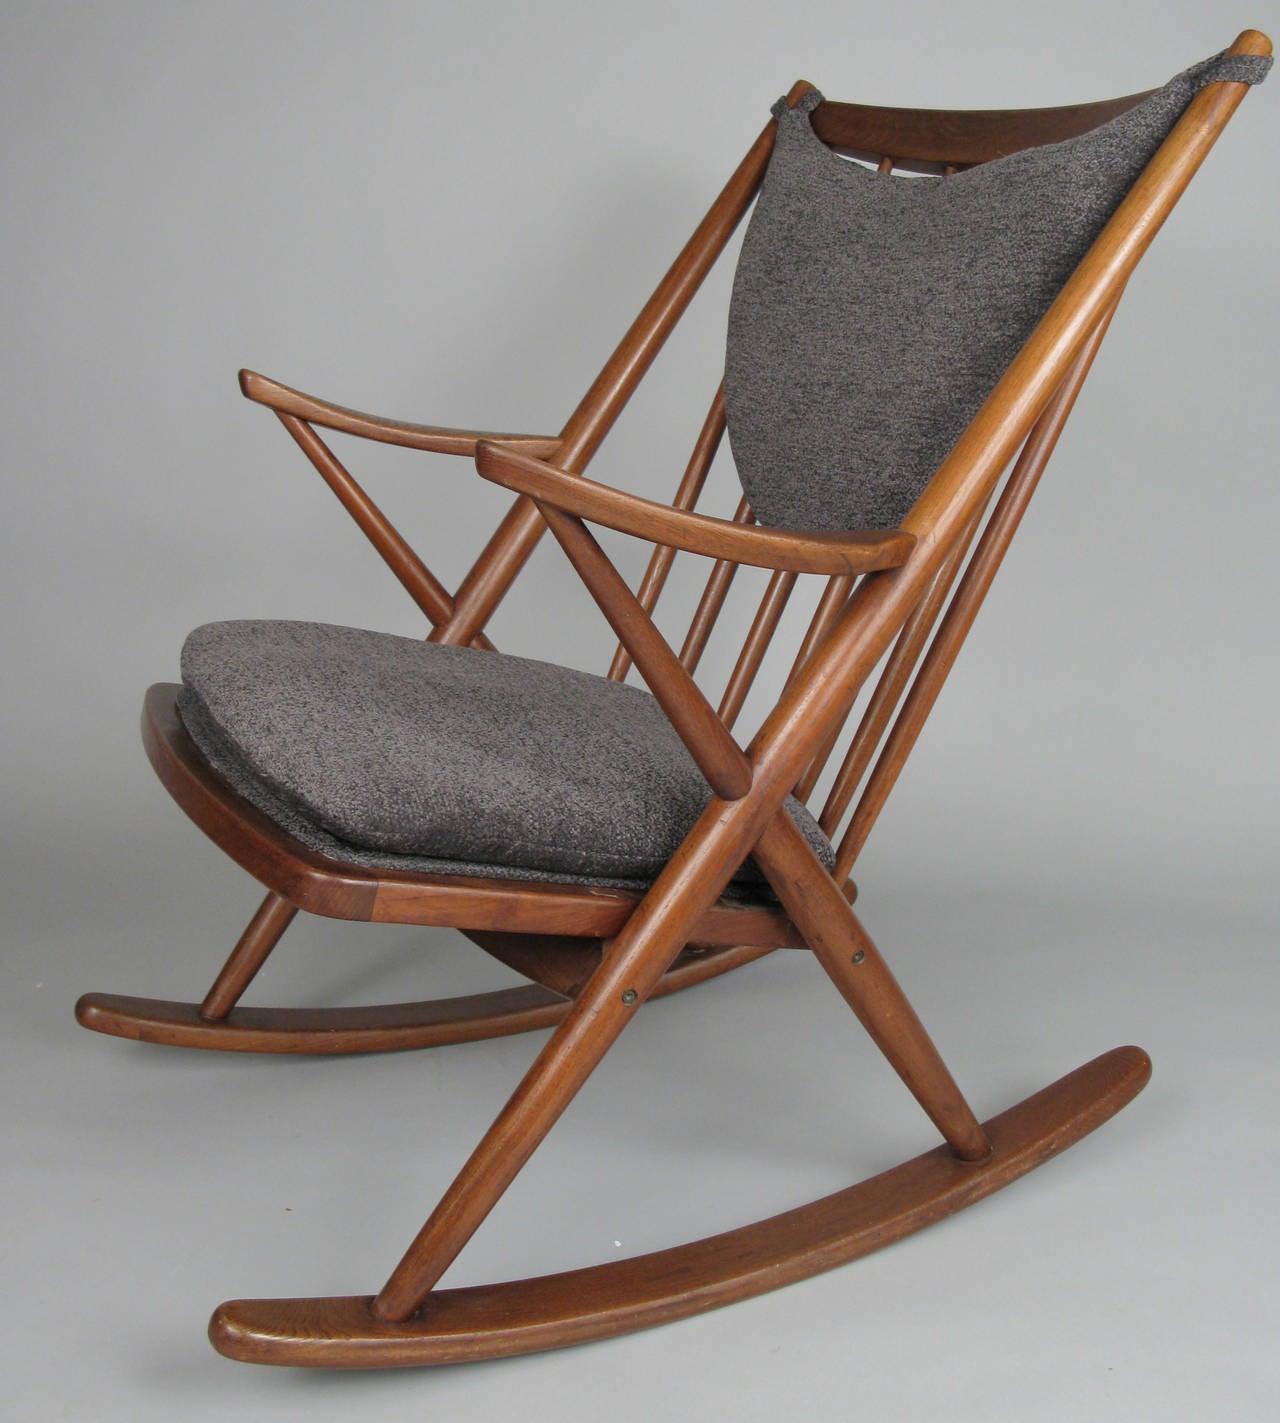 danish modern rocking chair prospera massage 1950s teak by frank reenskaug